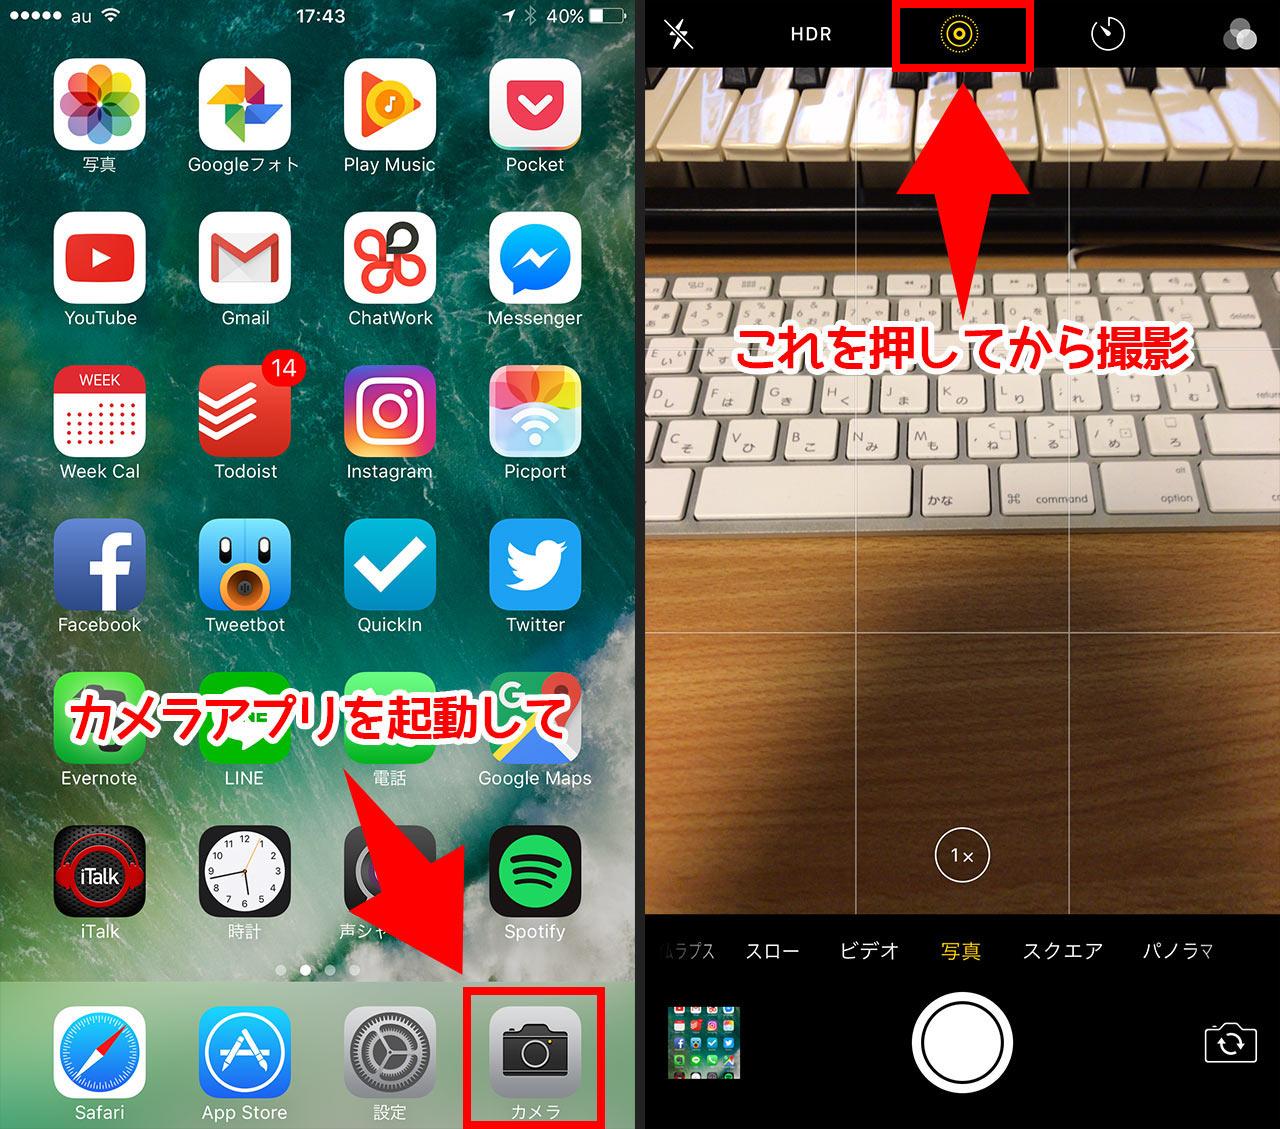 iphone-live-photos-lock-01